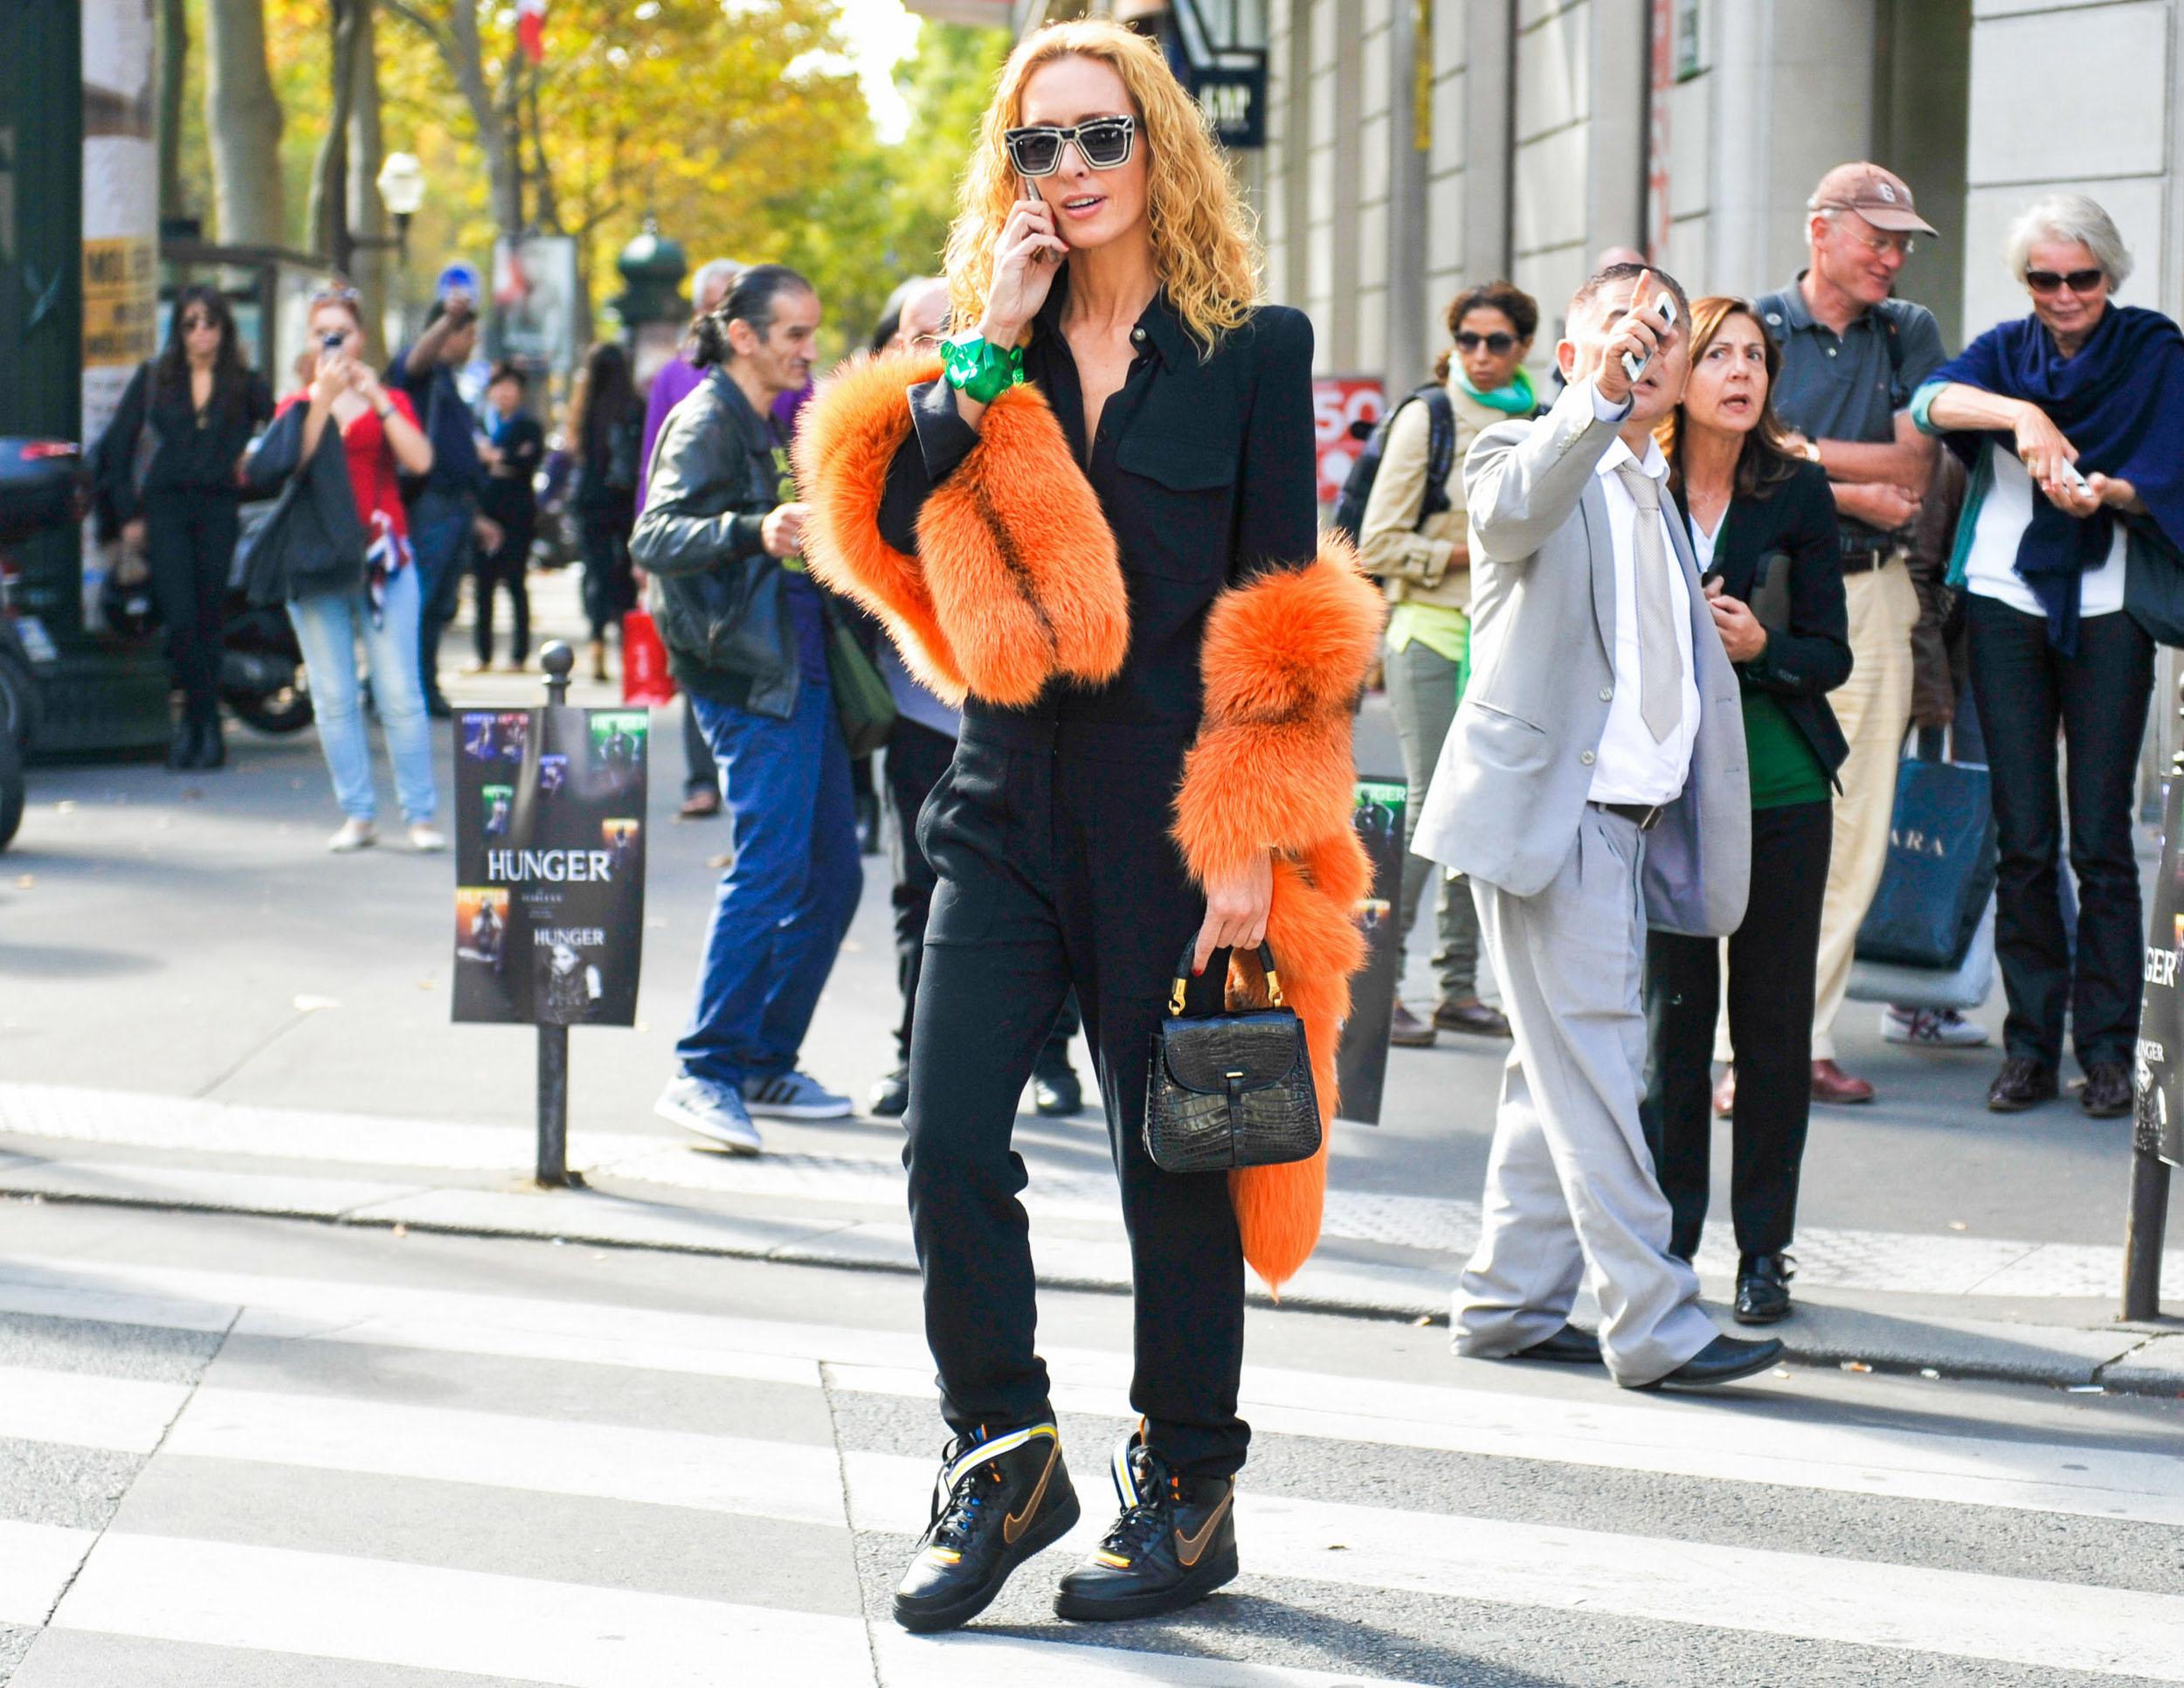 StreetStyle_ParisFashionWeek_LeandroJusten_067.jpg